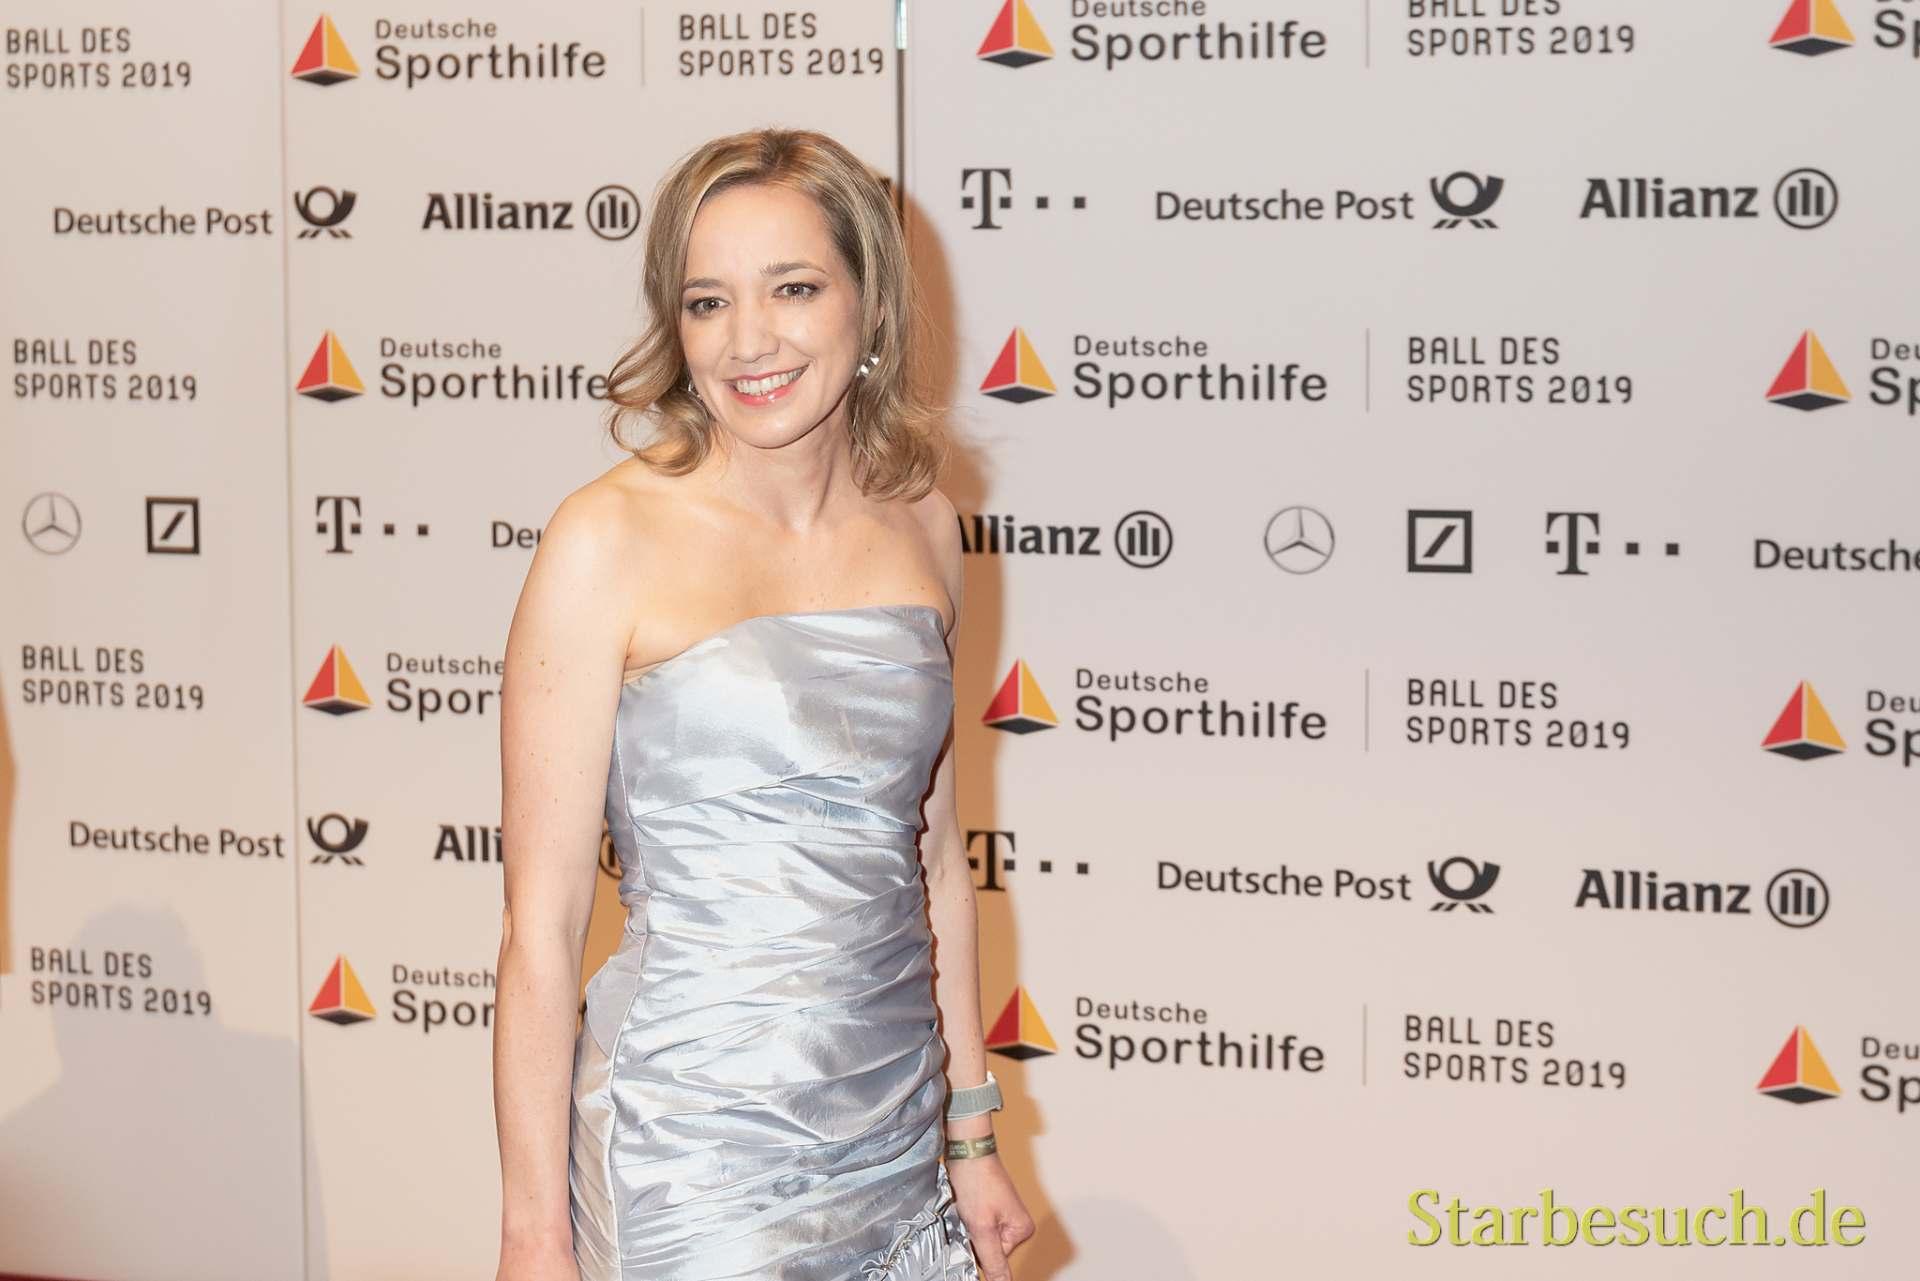 WIESBADEN, Germany - February 2nd, 2019: Kristina Schröder (*1977, German politician (CDU)) at Ball des Sports 2019